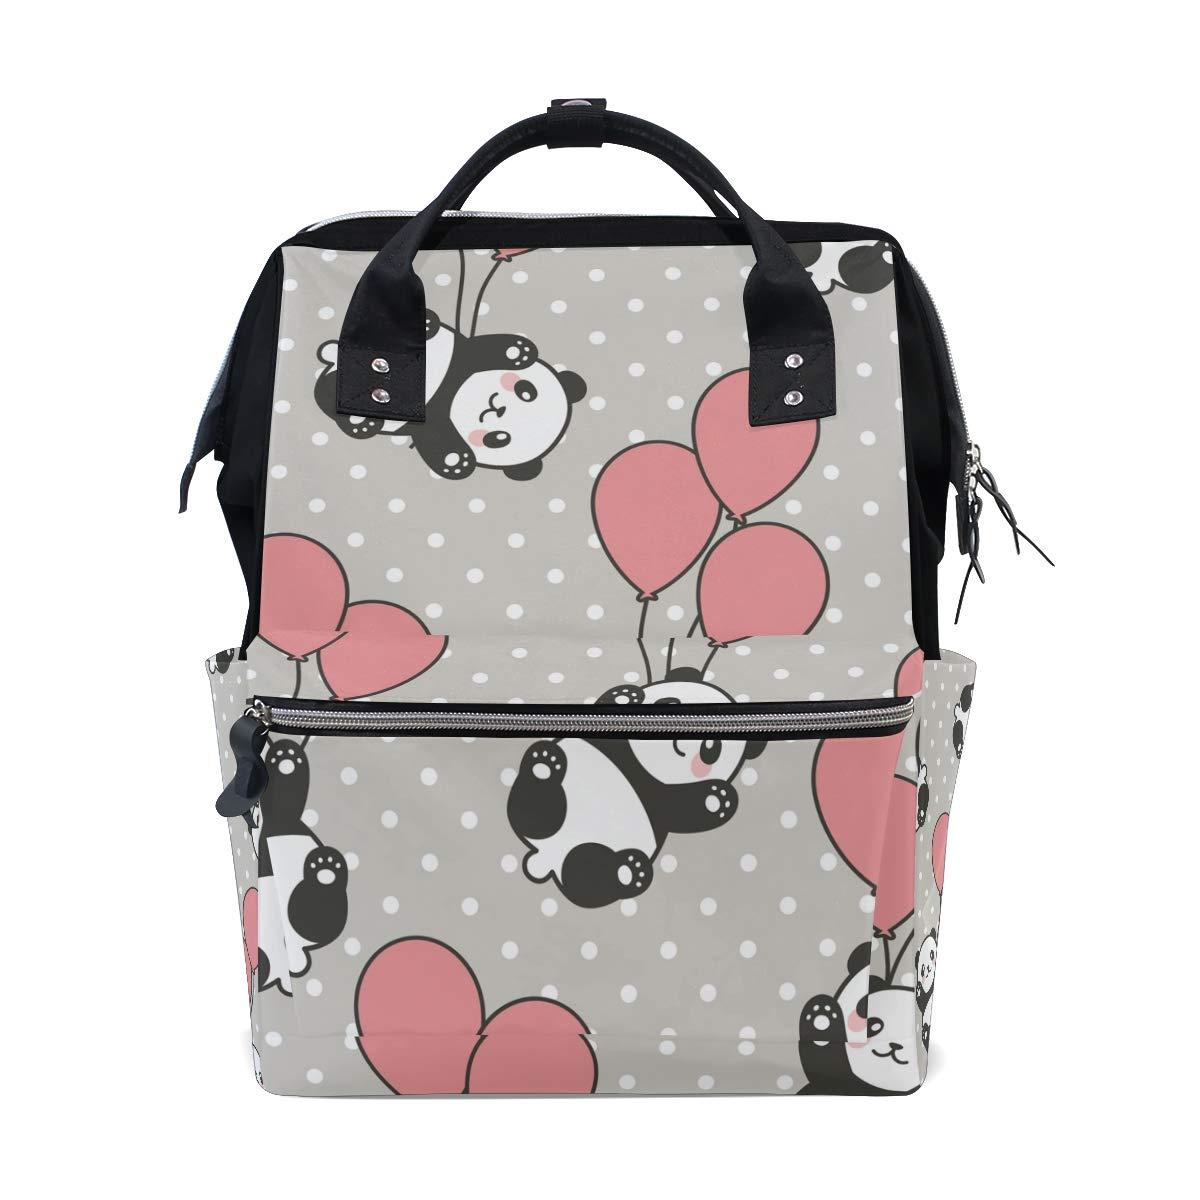 MERRYSUGAR Shiba Dog Cartoon Diaper Bag Backpack Travel Bag Large Multifunction Waterproof Stylish and Durable Nappy Bag for Baby Care School Backpack